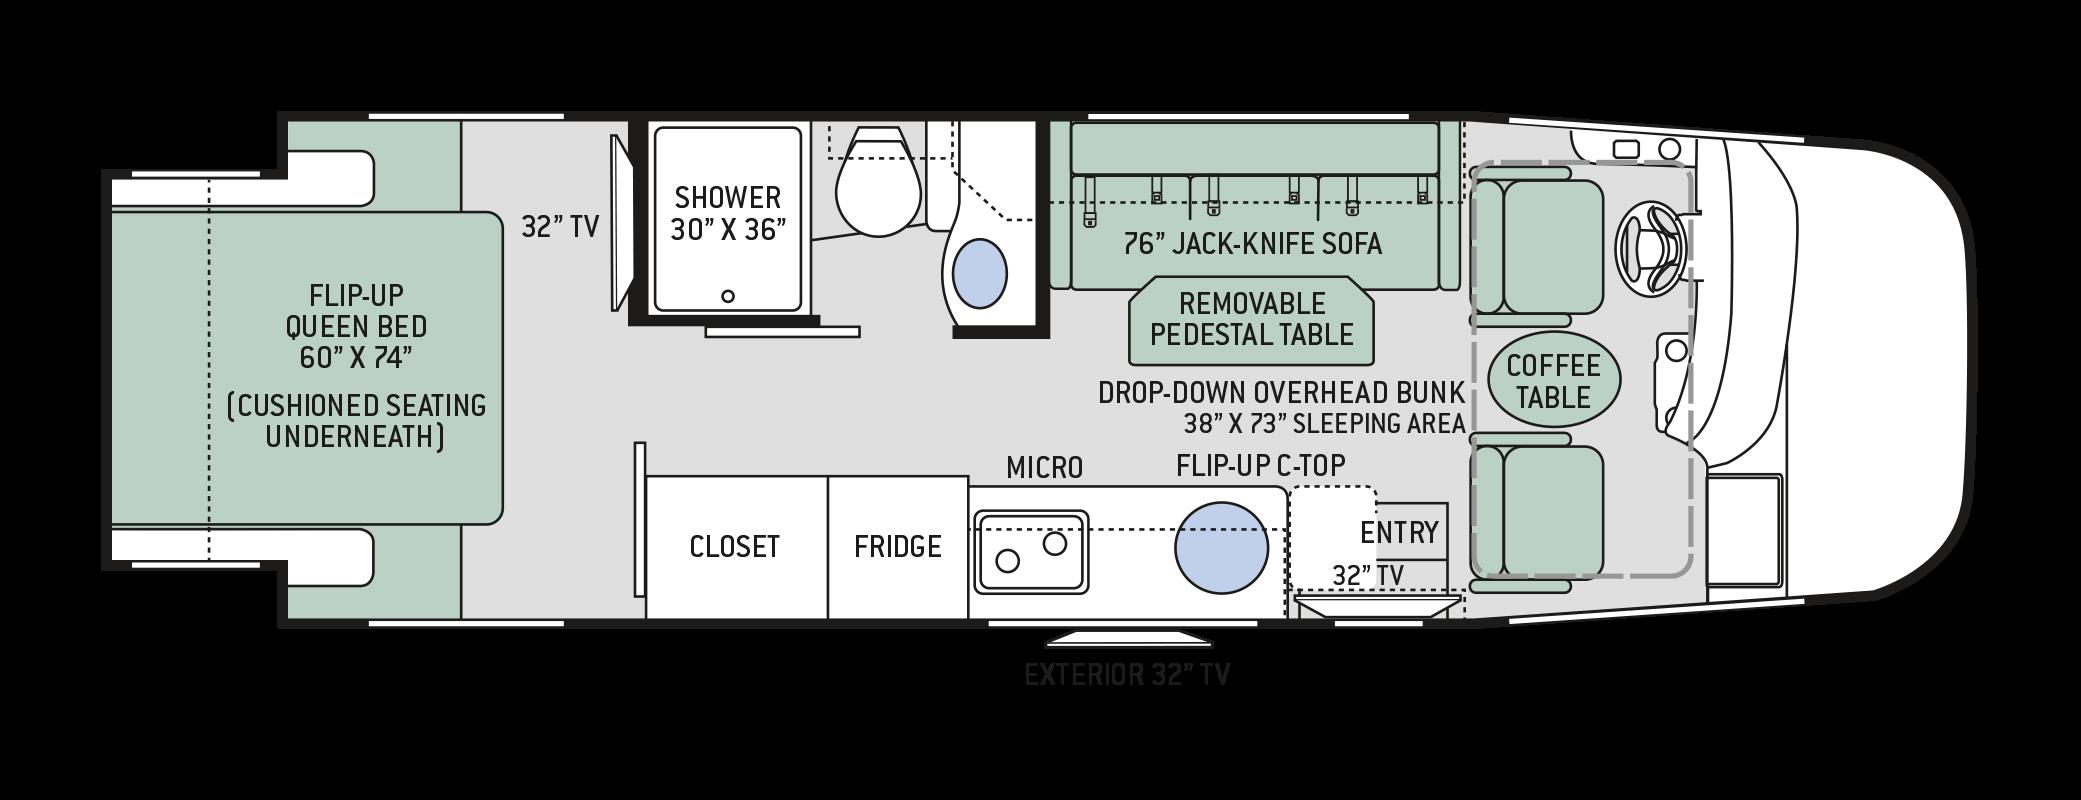 Floor Plans Vegas 25.2 Thor motor coach, Floor plans